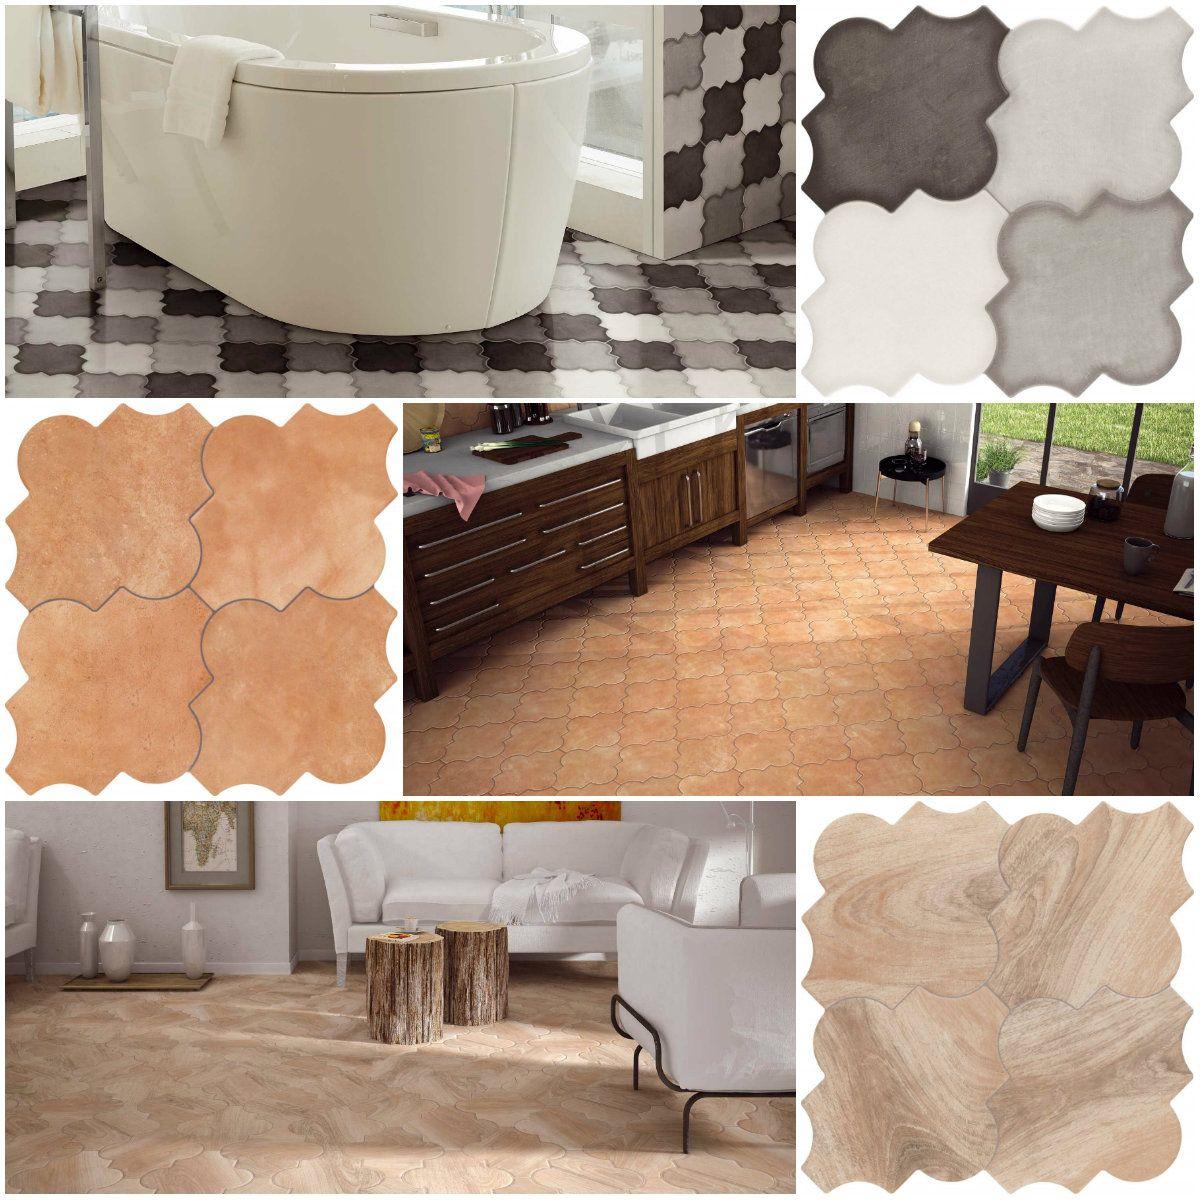 SERIE ETERNITY 45X45 Porcelánico. #welovetiles #tileofspain #spain #azulejo #tile #design #interiordesign #porcelain